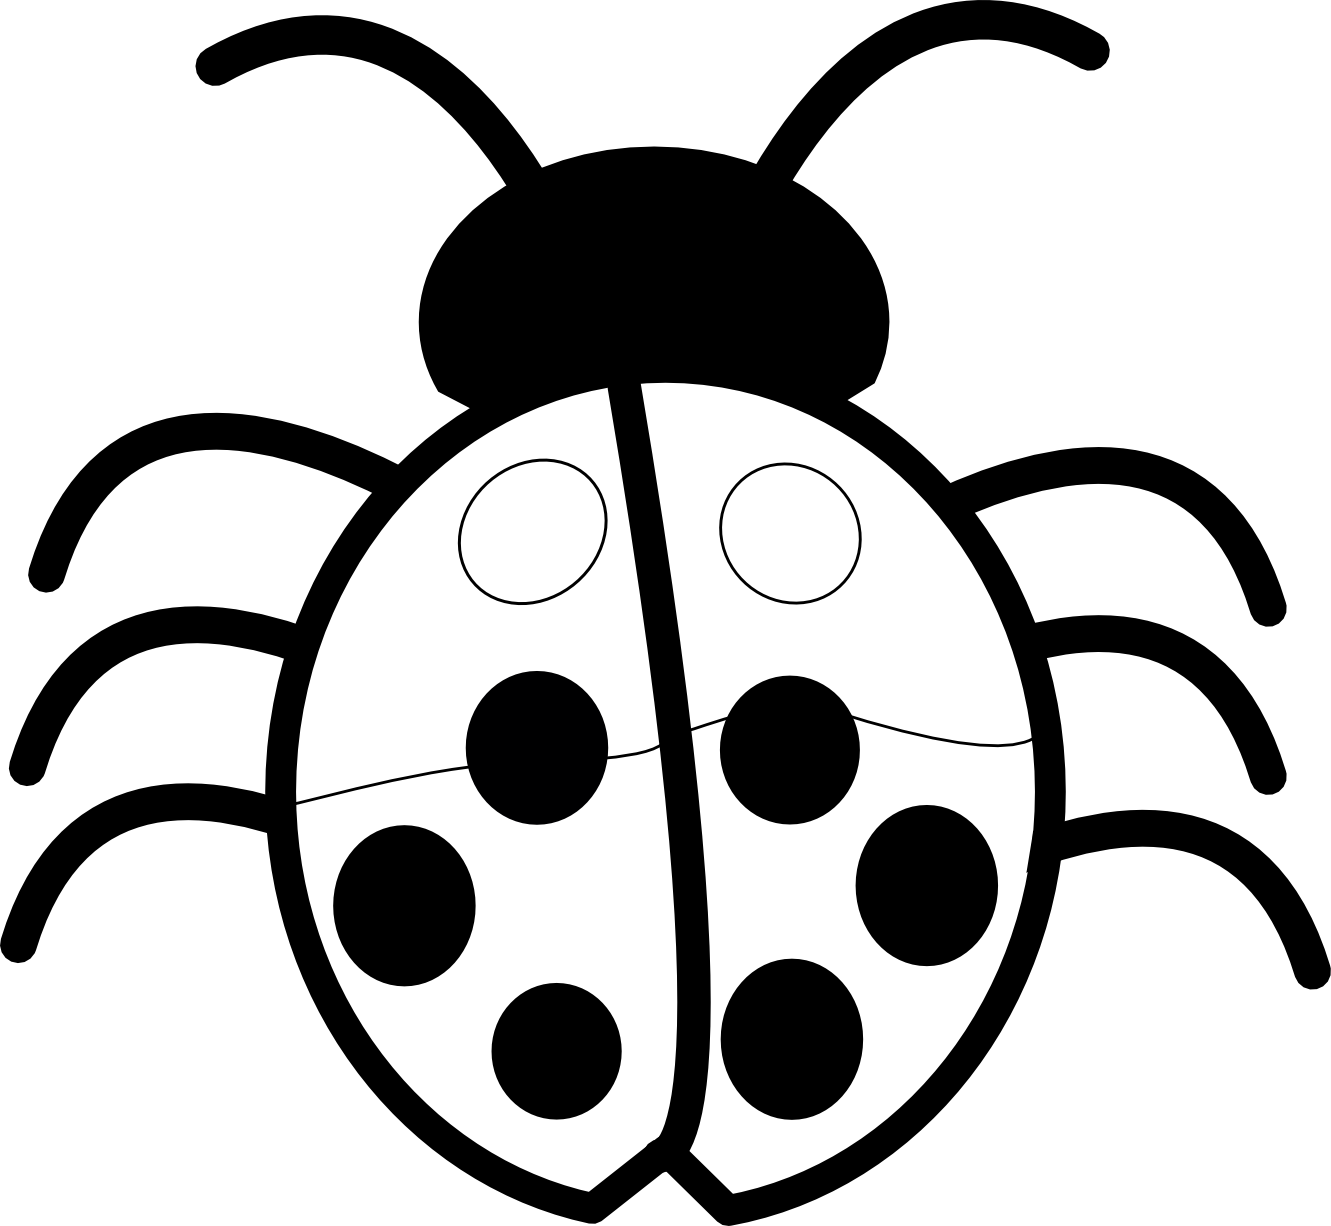 Ladybug outline clipart 4